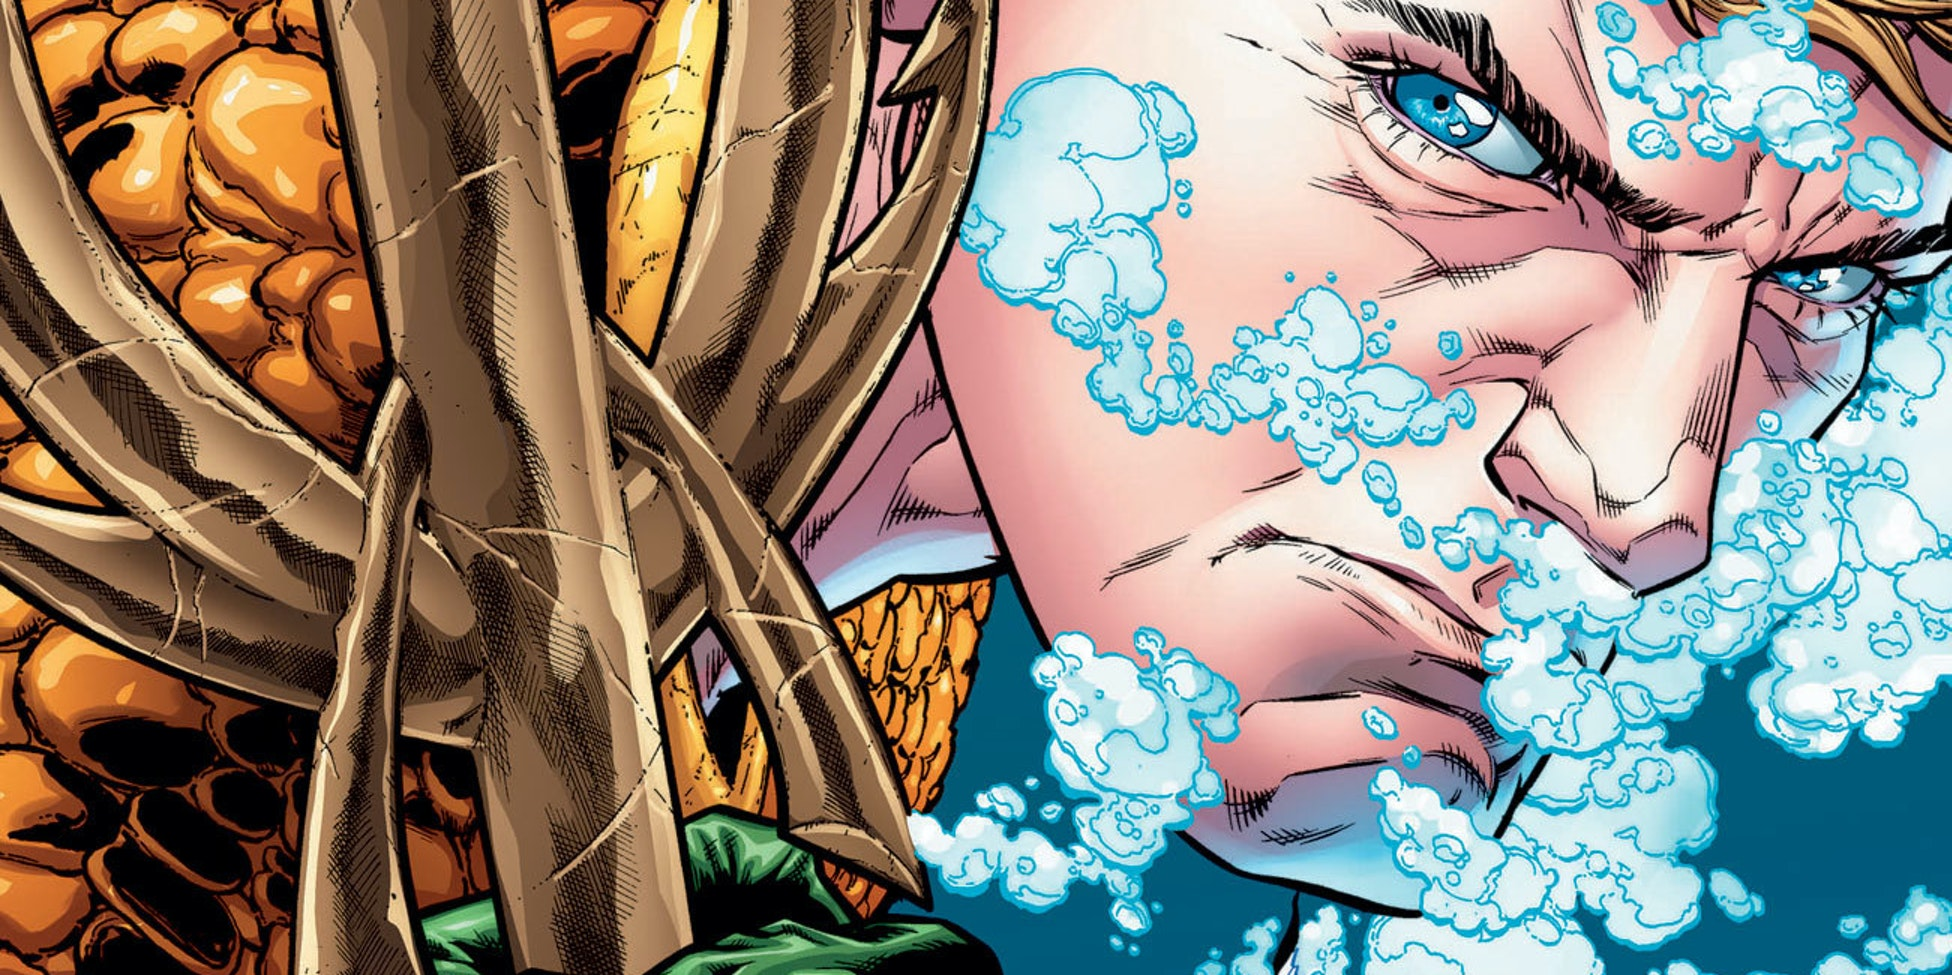 'Aquaman: Rebirth' #1 Illustrates Much James Wan's Superhero Film Will Have To Prove